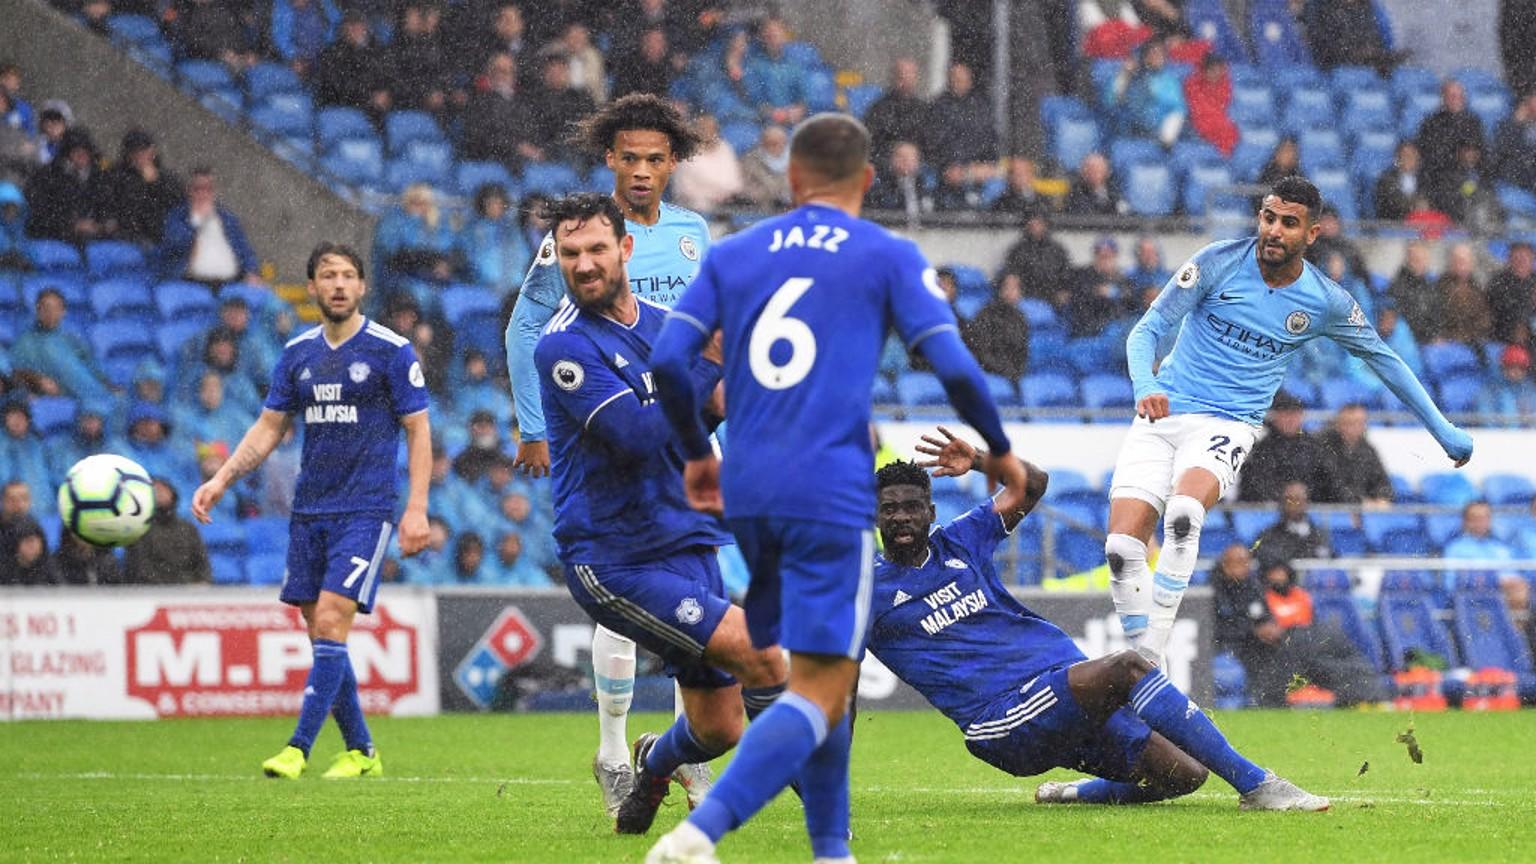 FIVE-STAR CITY: Riyad Mahrez scores his second and City's fifth